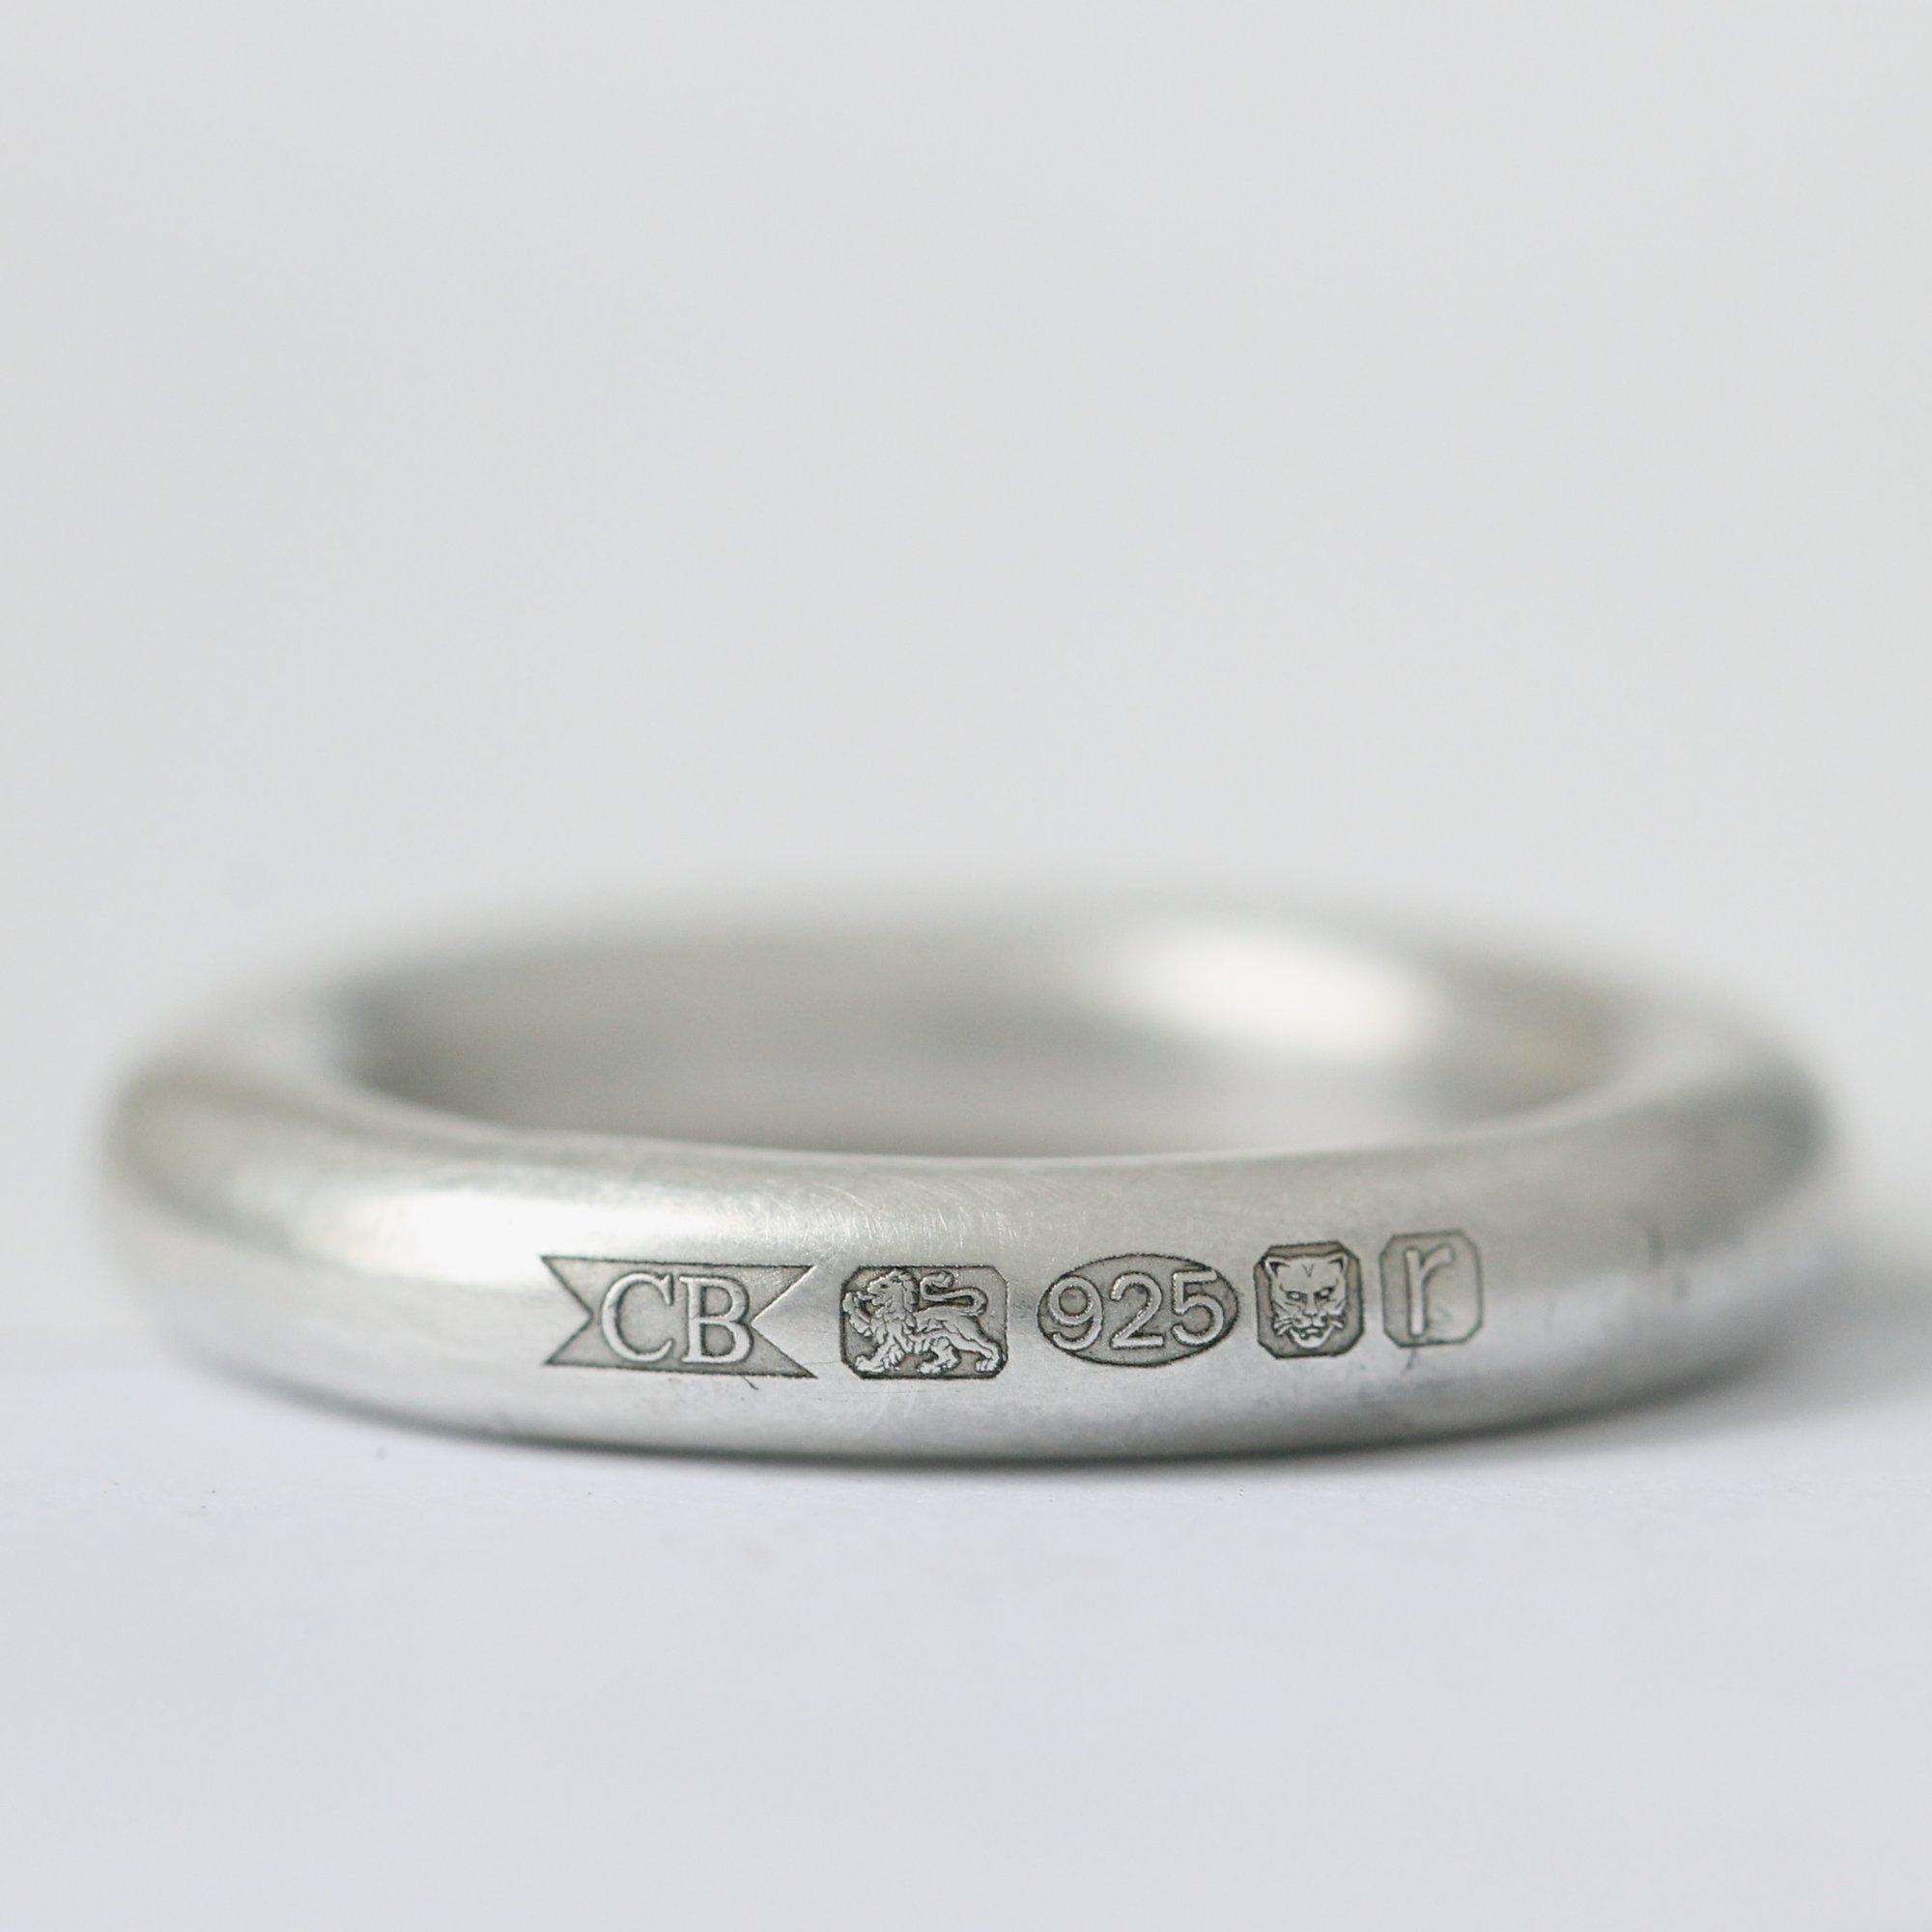 7eeb866d15 Chunky Silver Rings Mens - Foto Ring and Wallpaper